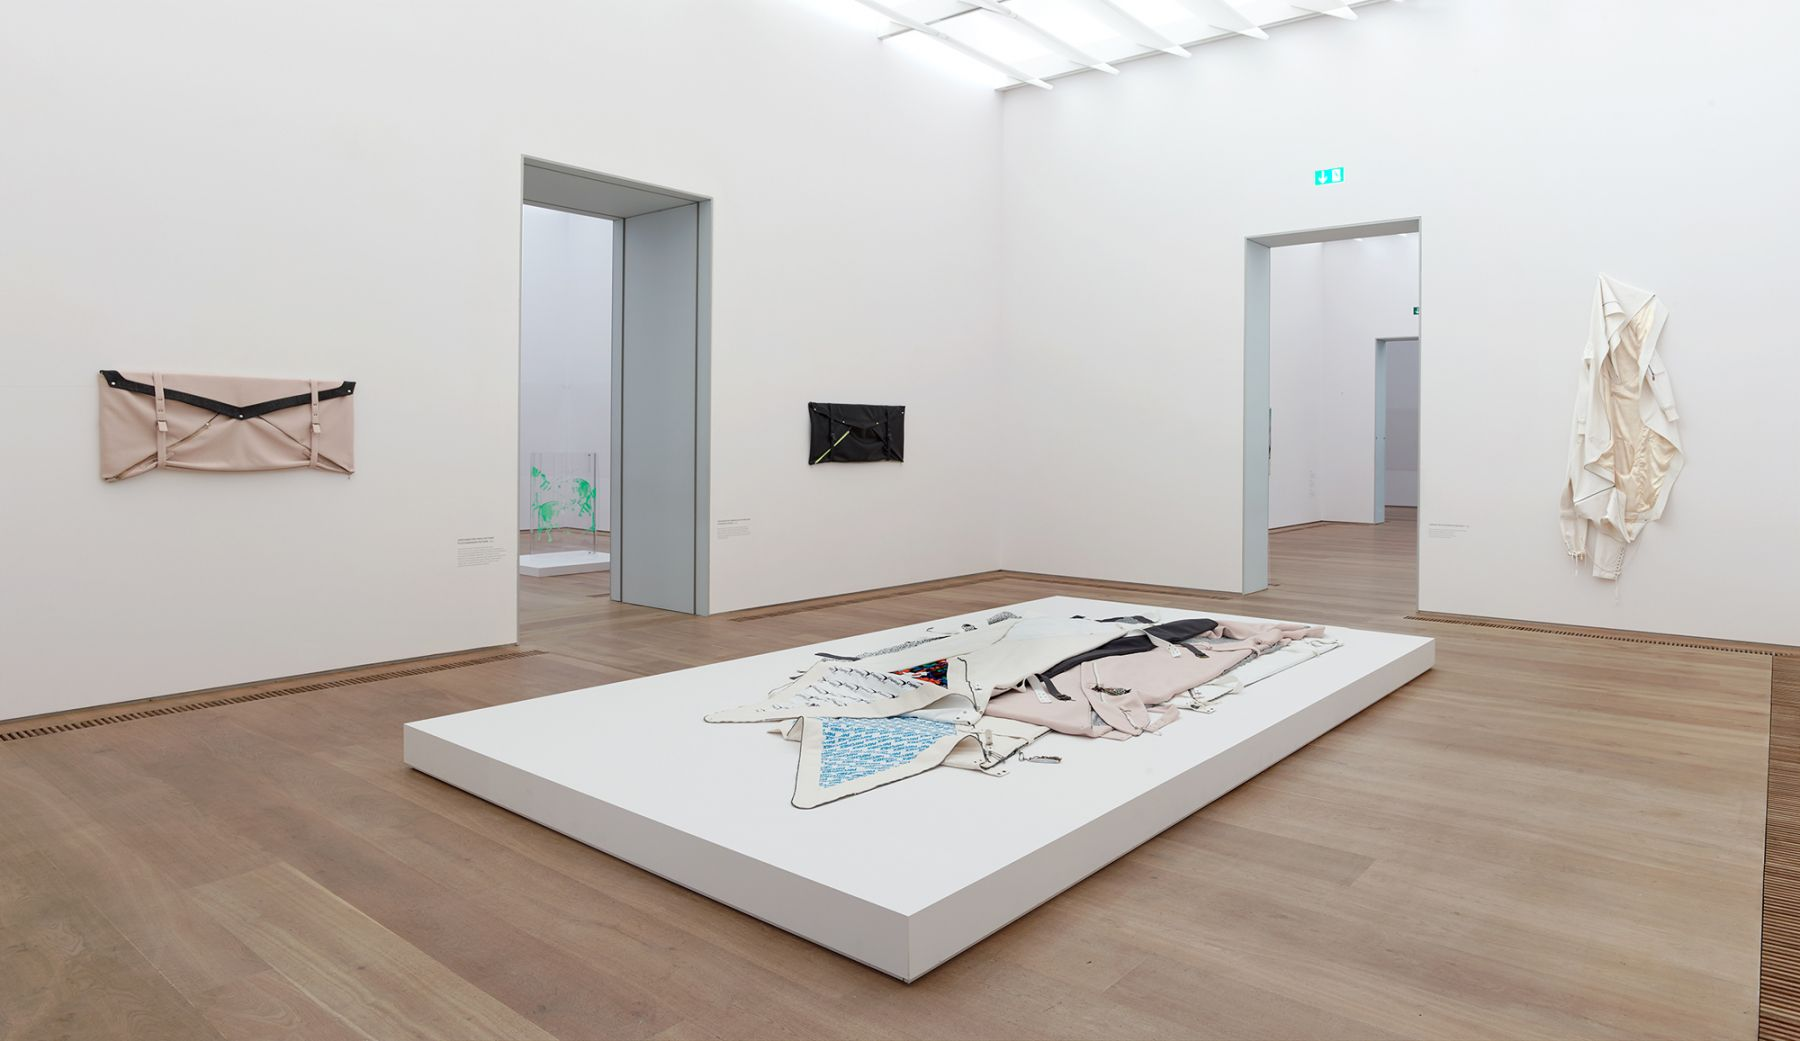 Social SyntheticMuseum BrandhorstInstallation view2017-18